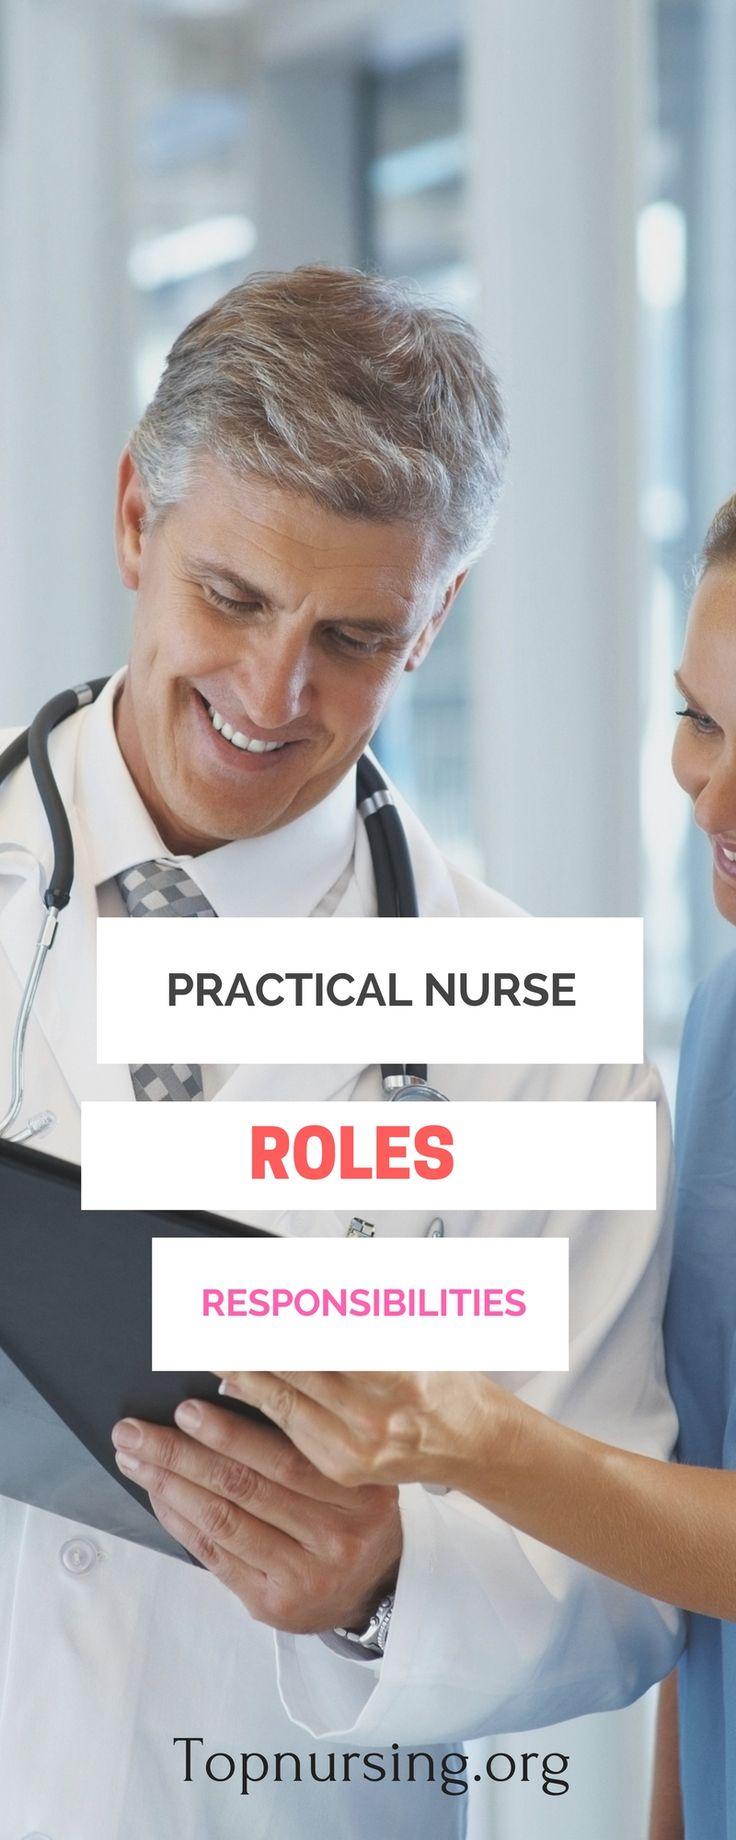 Licensed Practical Nurse (LPN) Job Description, Roles, Duties & Responsibilities